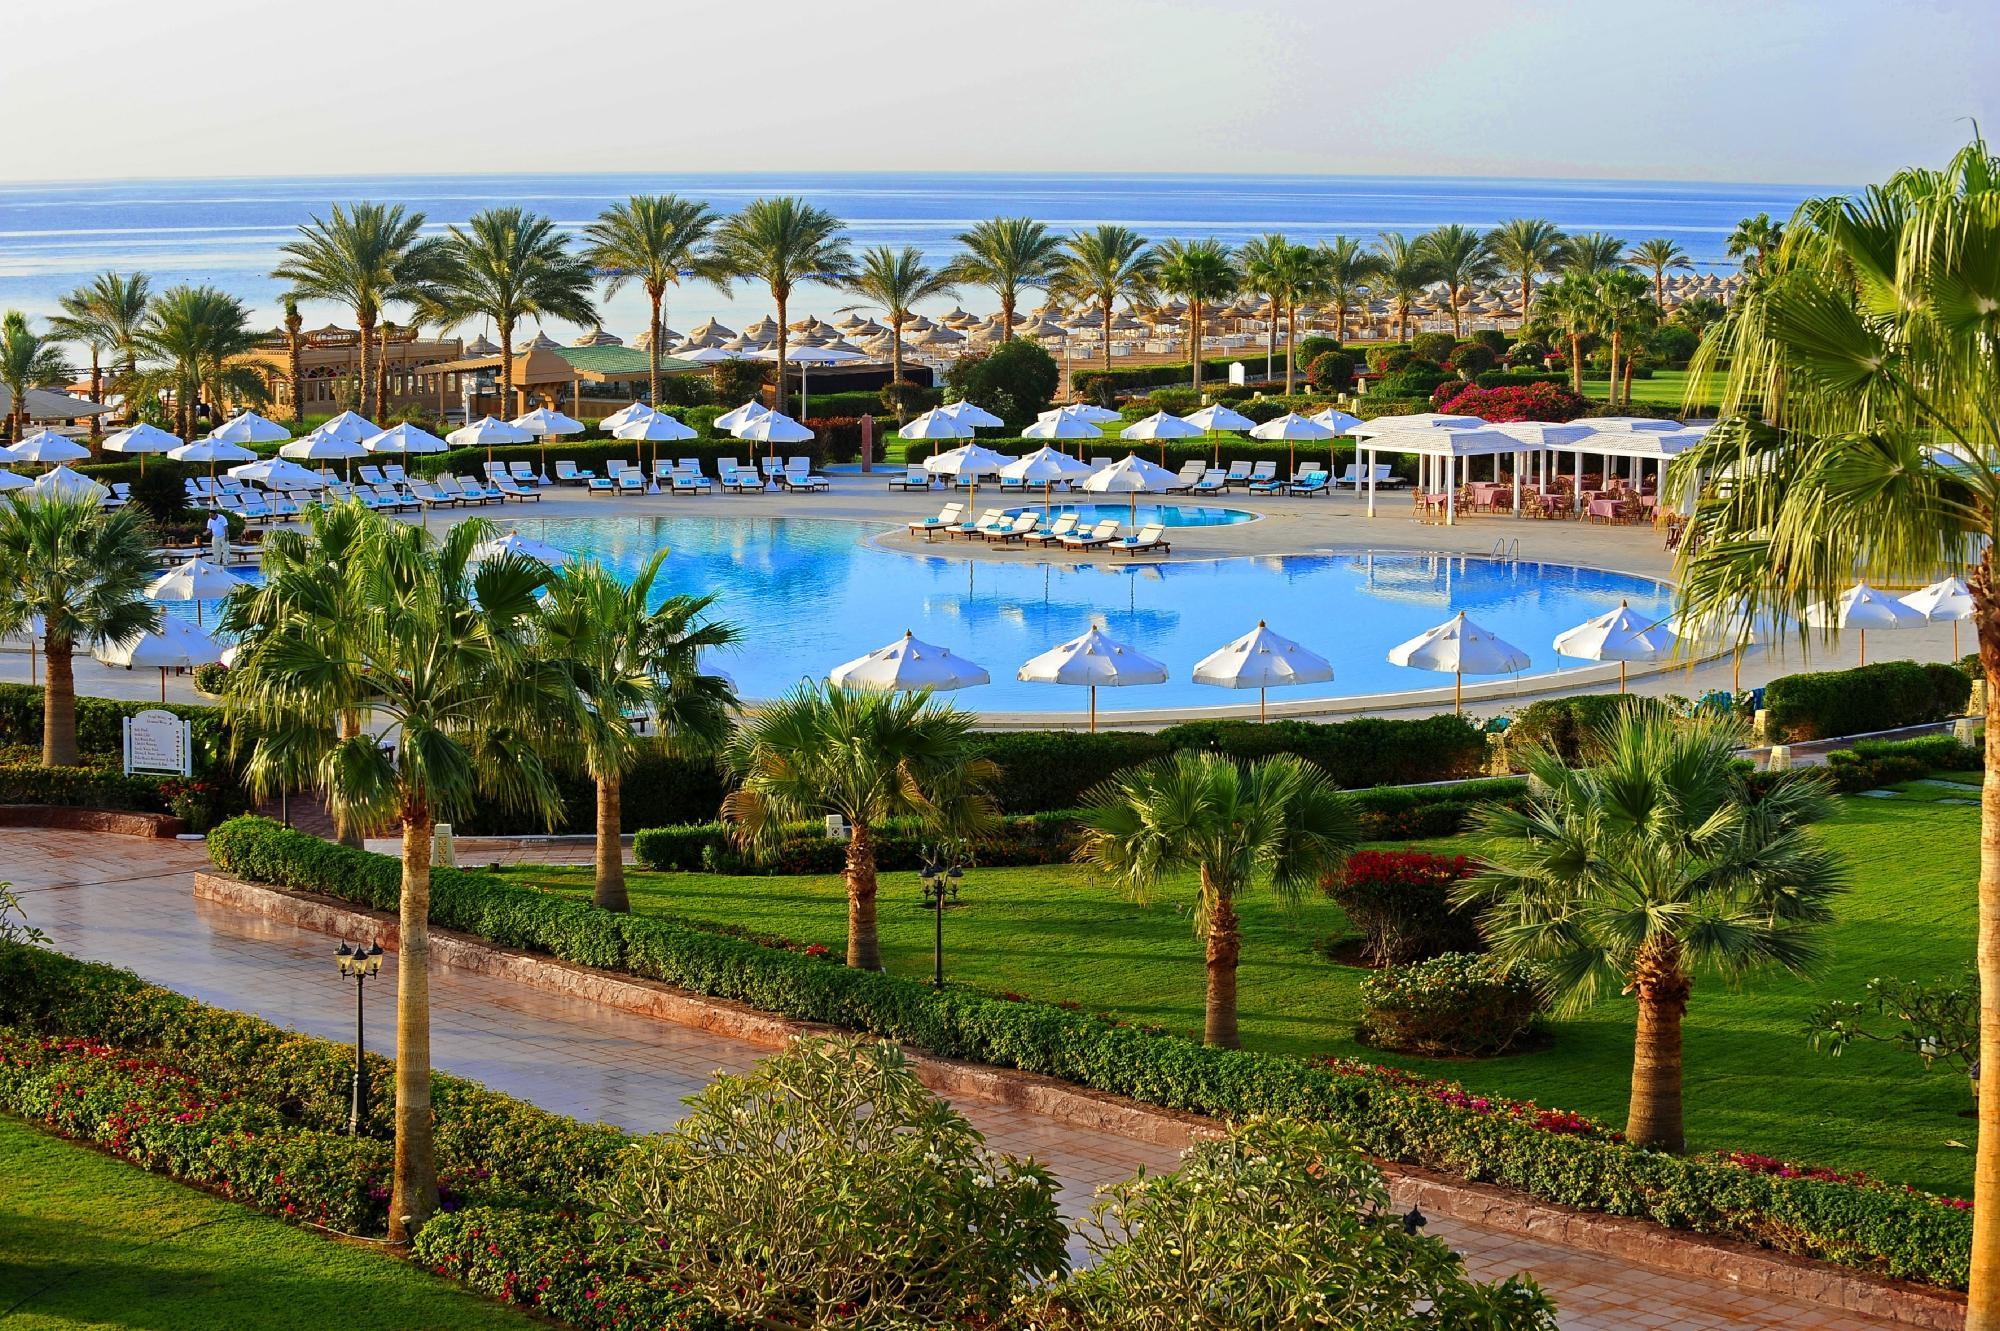 Video villaggio Sharm Seaclub Baron Resort and Palms raffinato